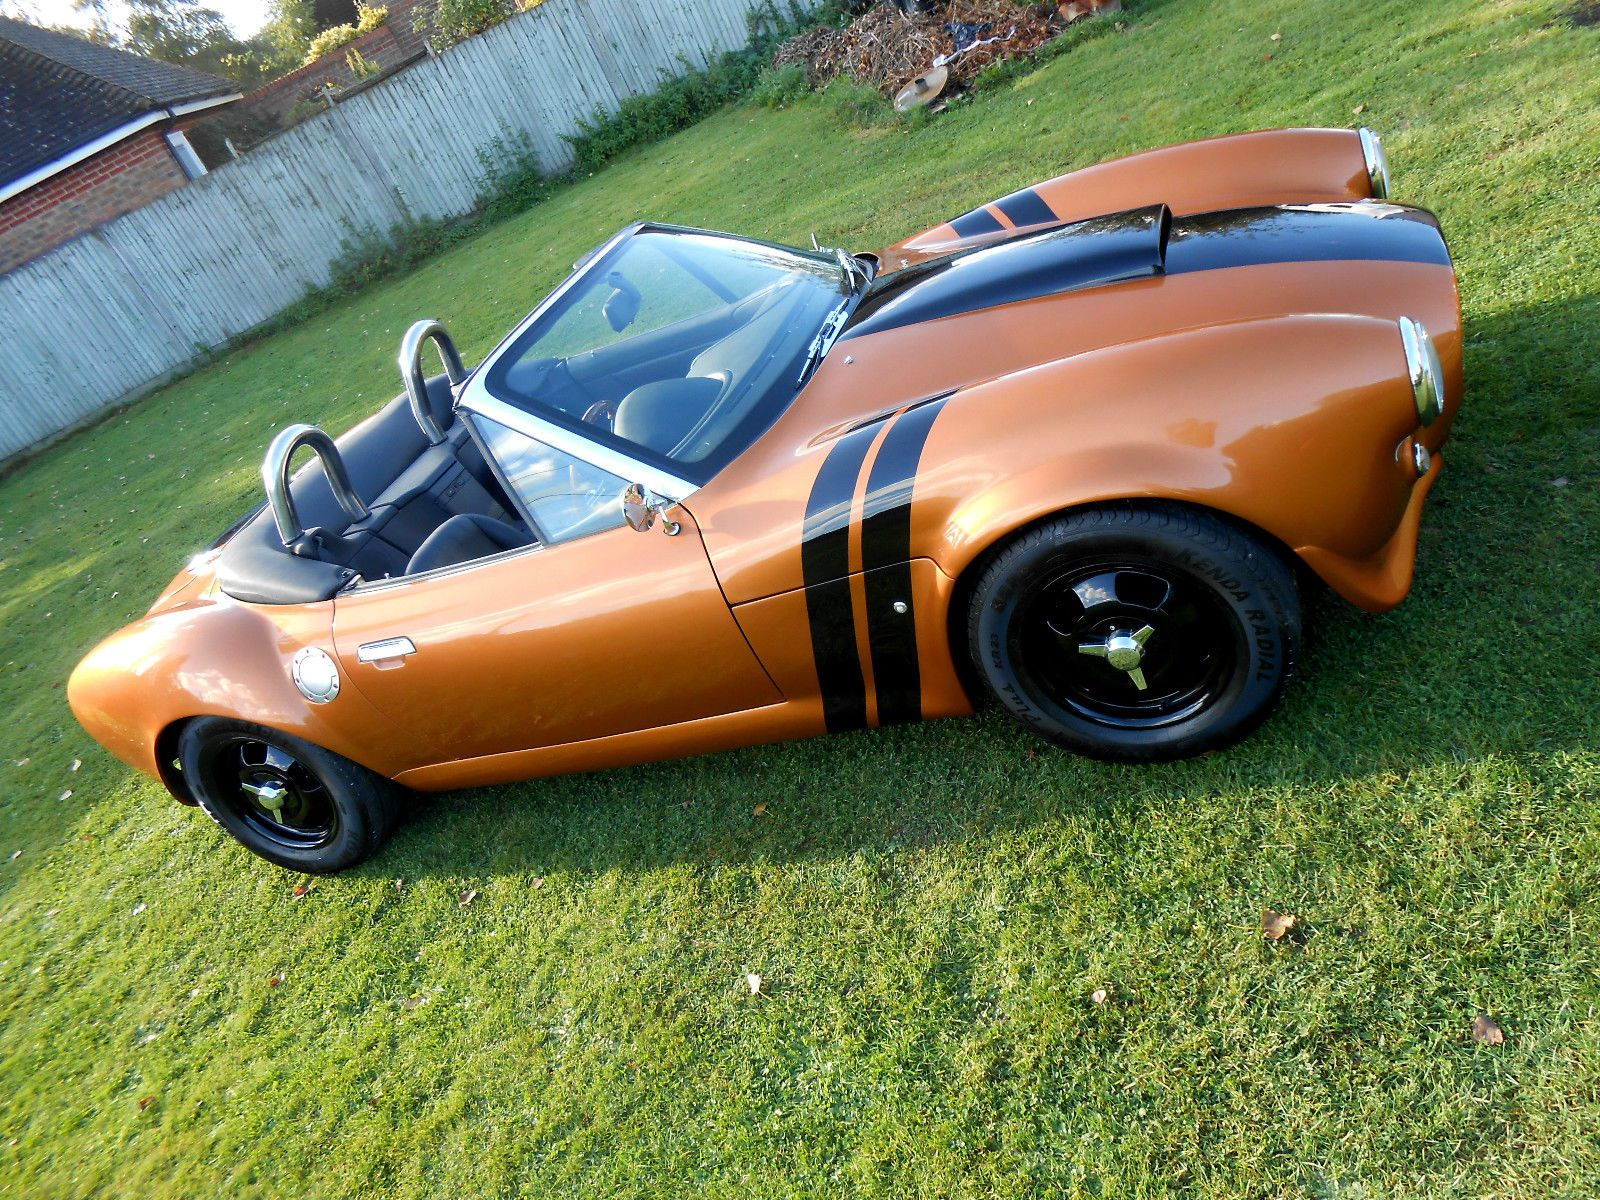 Ac Cobra Replica Kit Based On A Bmw Kit Car Cheap Fast Build No